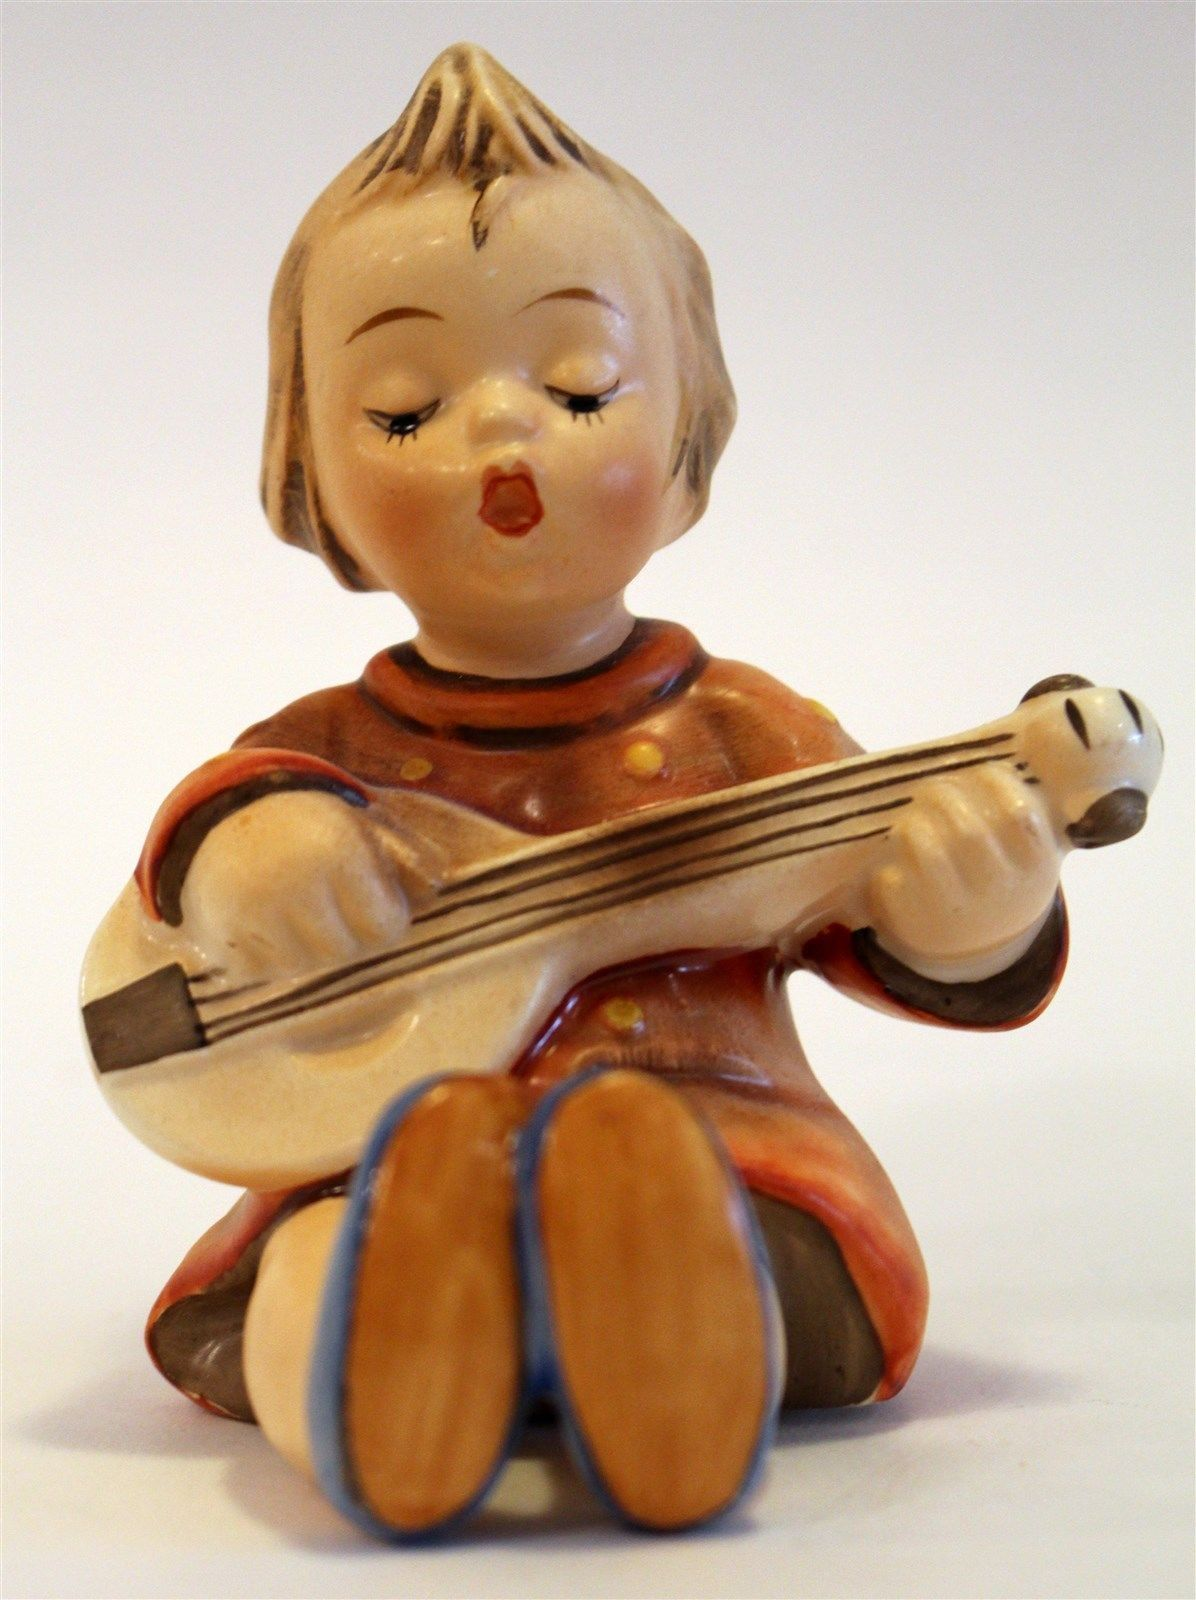 hummel figurines -- Antique Price Guide | Hummel figurines ...